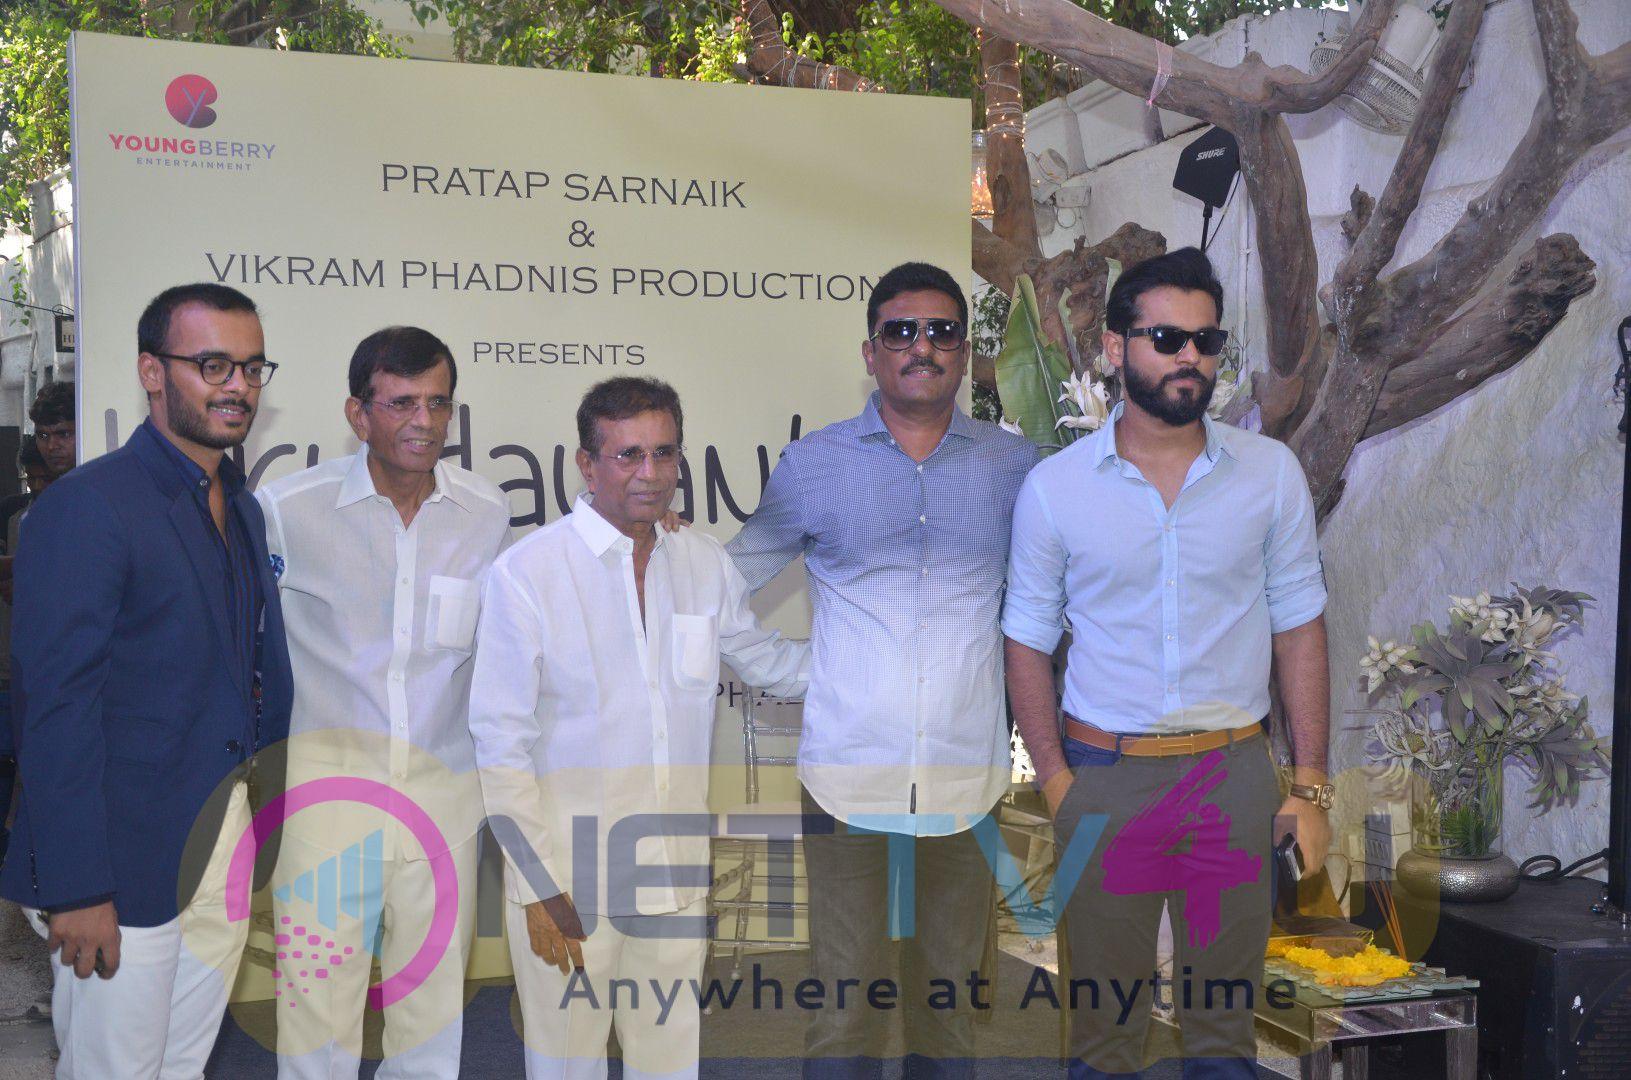 Shah Rukh Khan Launches 1st Look Of Vikram Phadnis' Debut Film Cute Stills